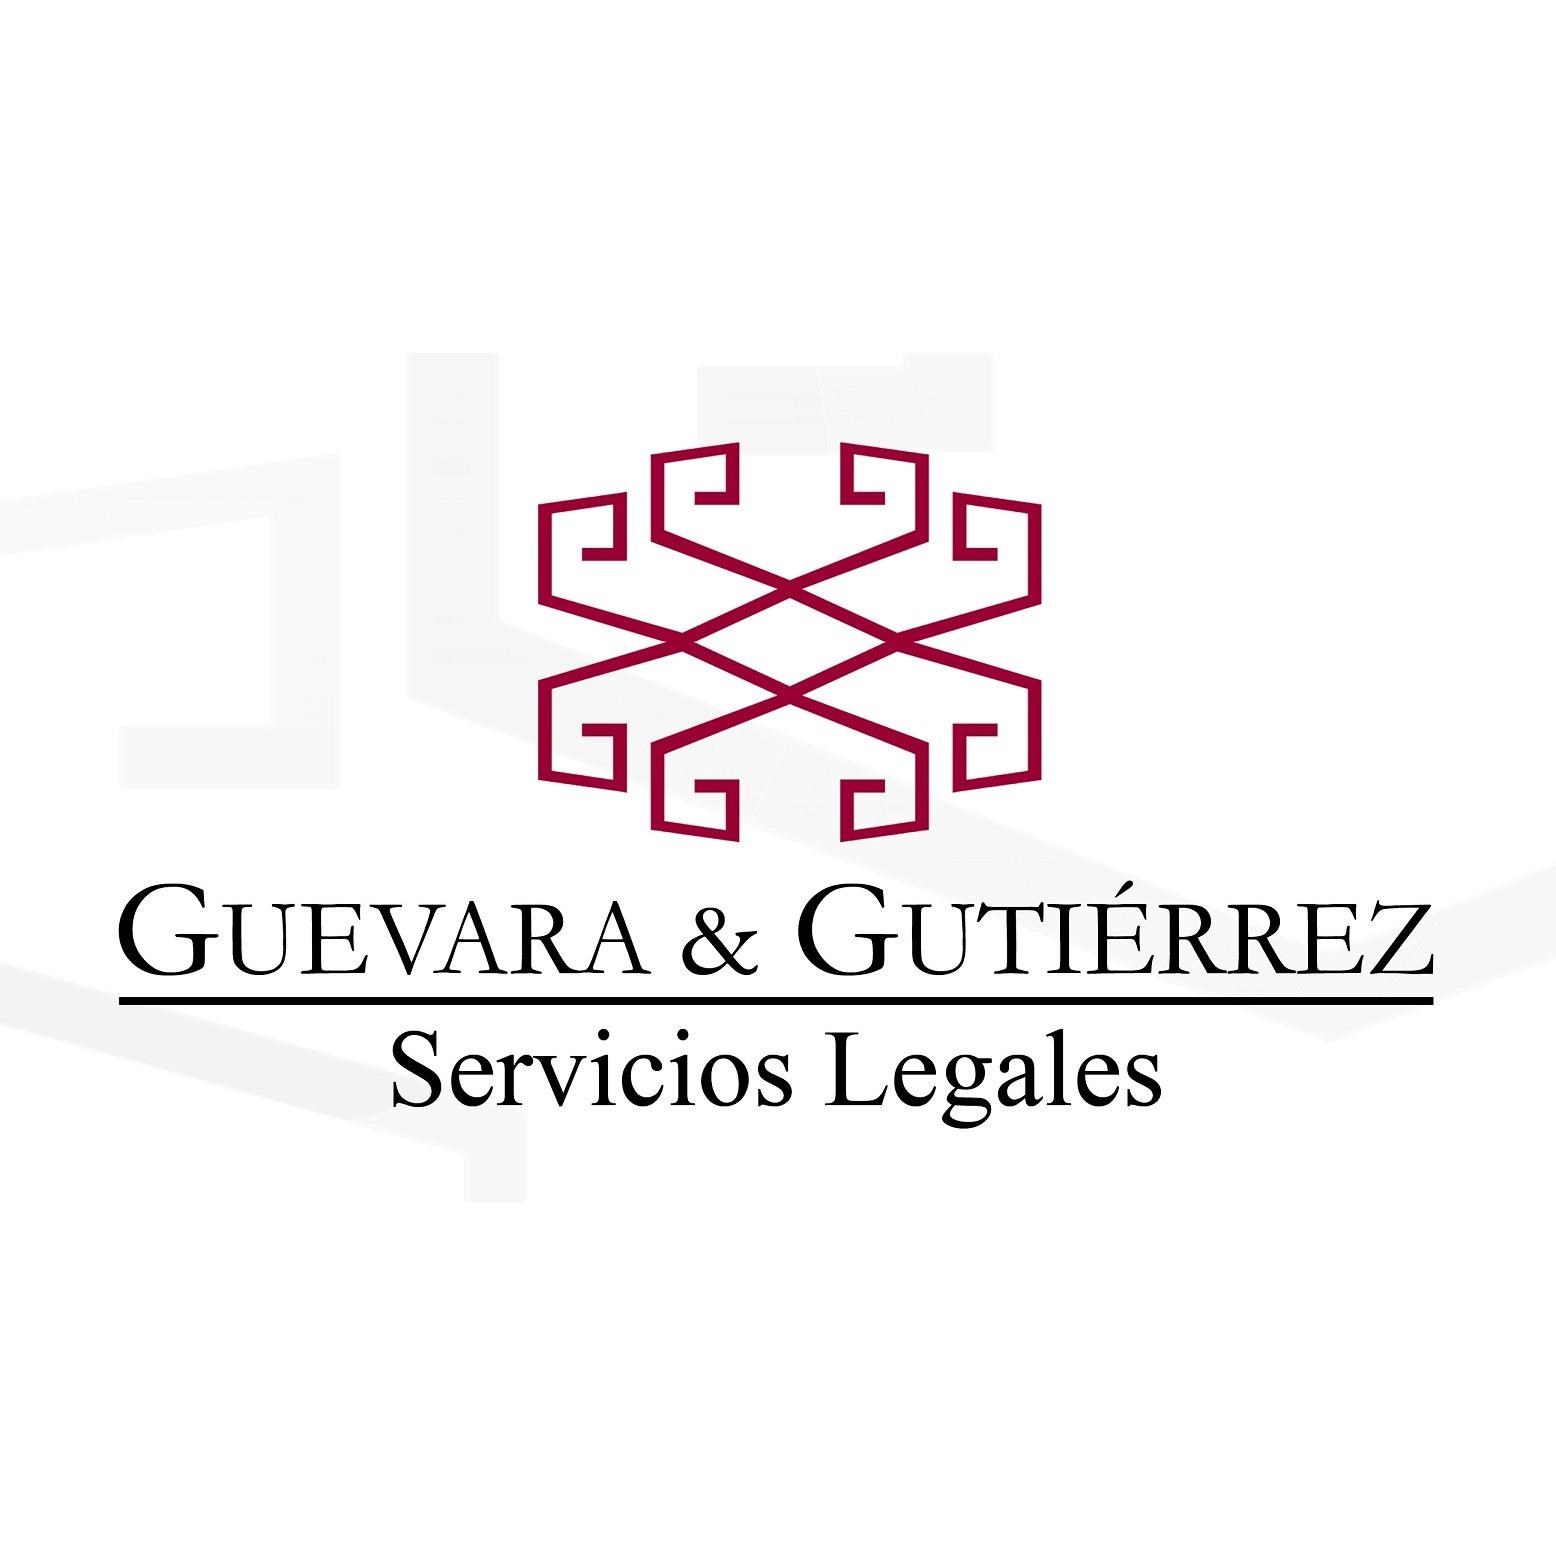 the Guevara & Gutiérrez logo.